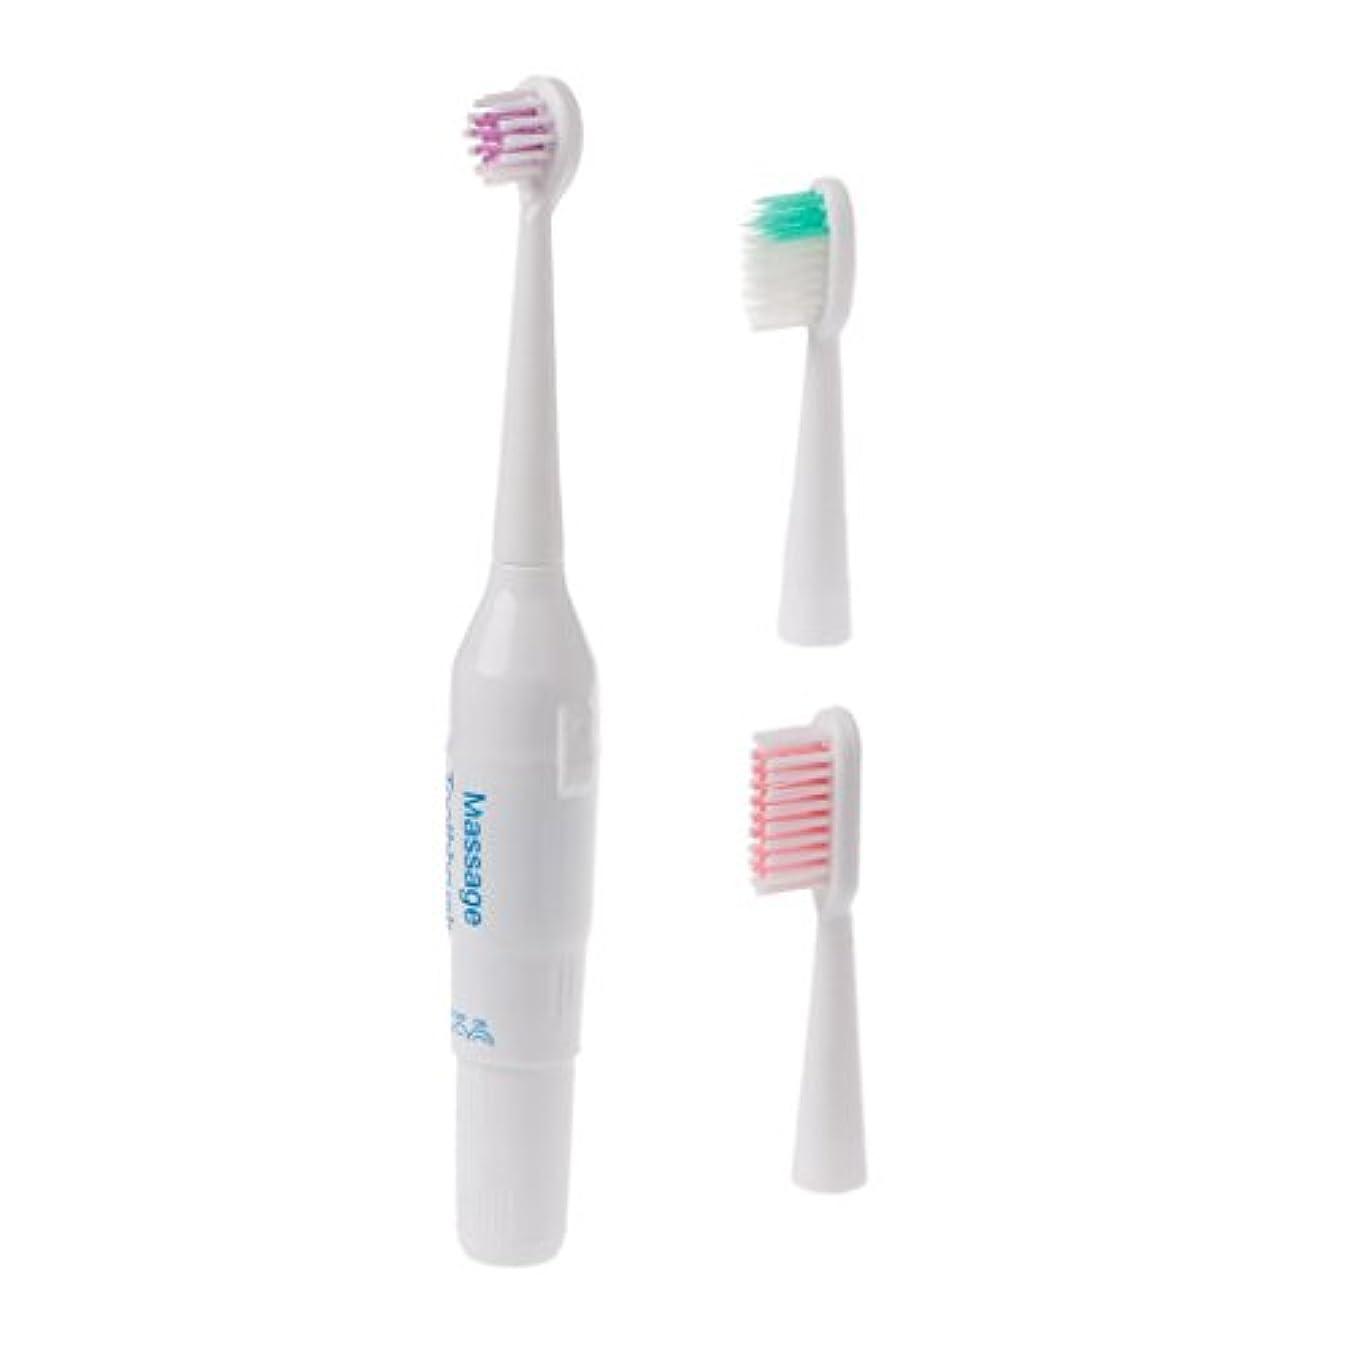 Manyao キッズプロフェッショナル口腔ケアクリーン電気歯ブラシパワーベビー用歯ブラシ